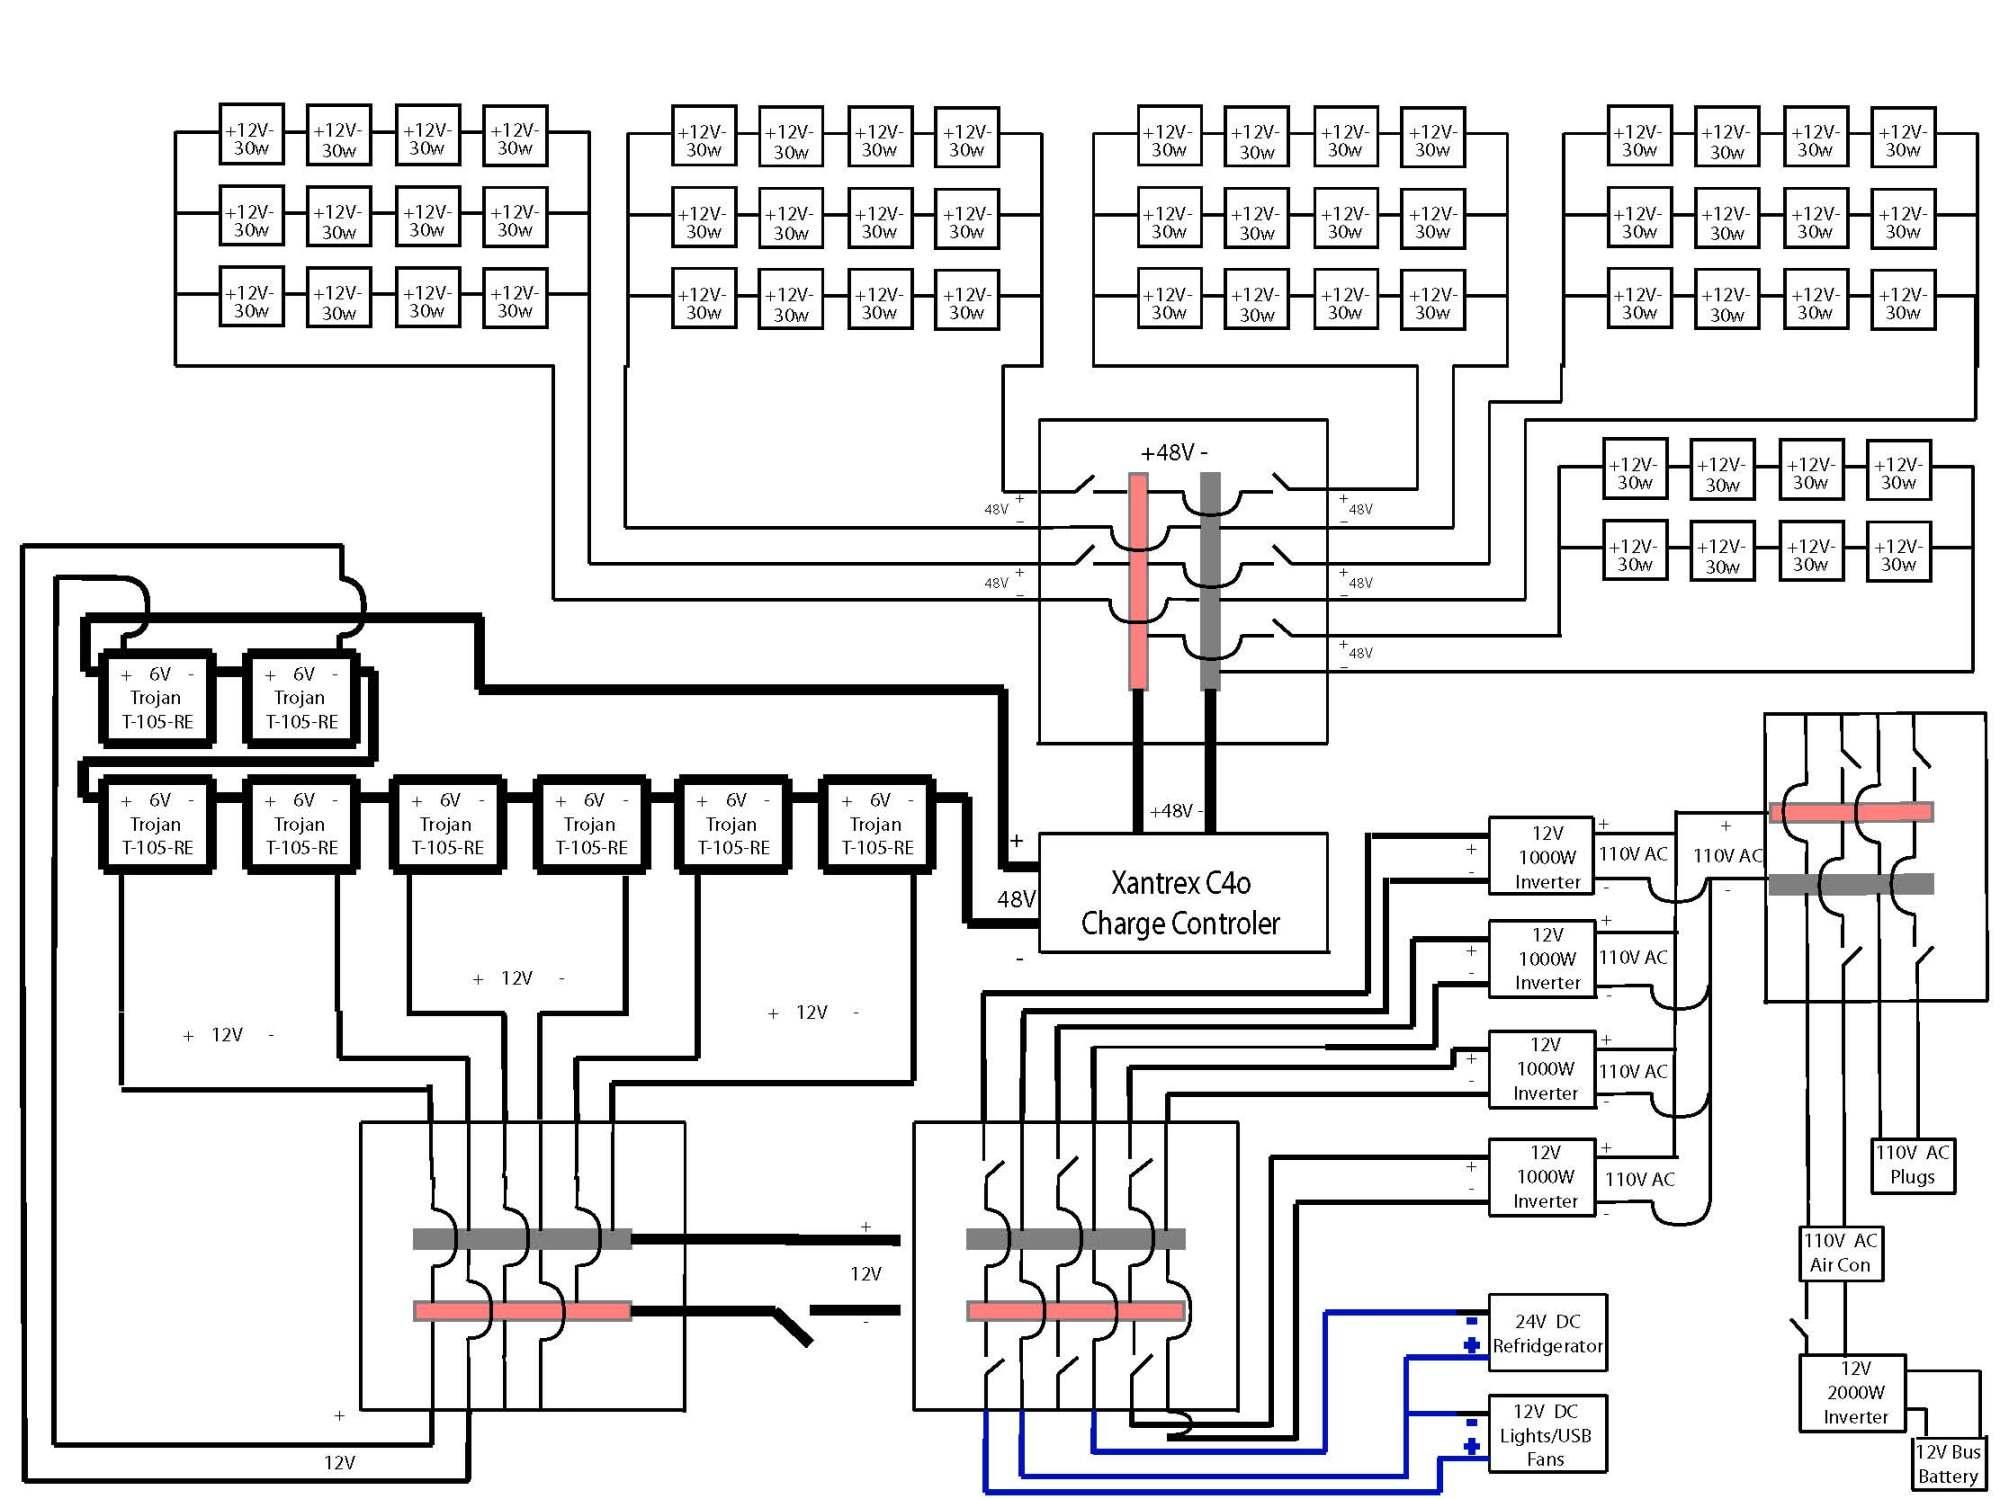 hight resolution of 1996 bluebird bus wiring diagram wiring diagram third level1996 bluebird bus wiring diagram completed wiring diagrams